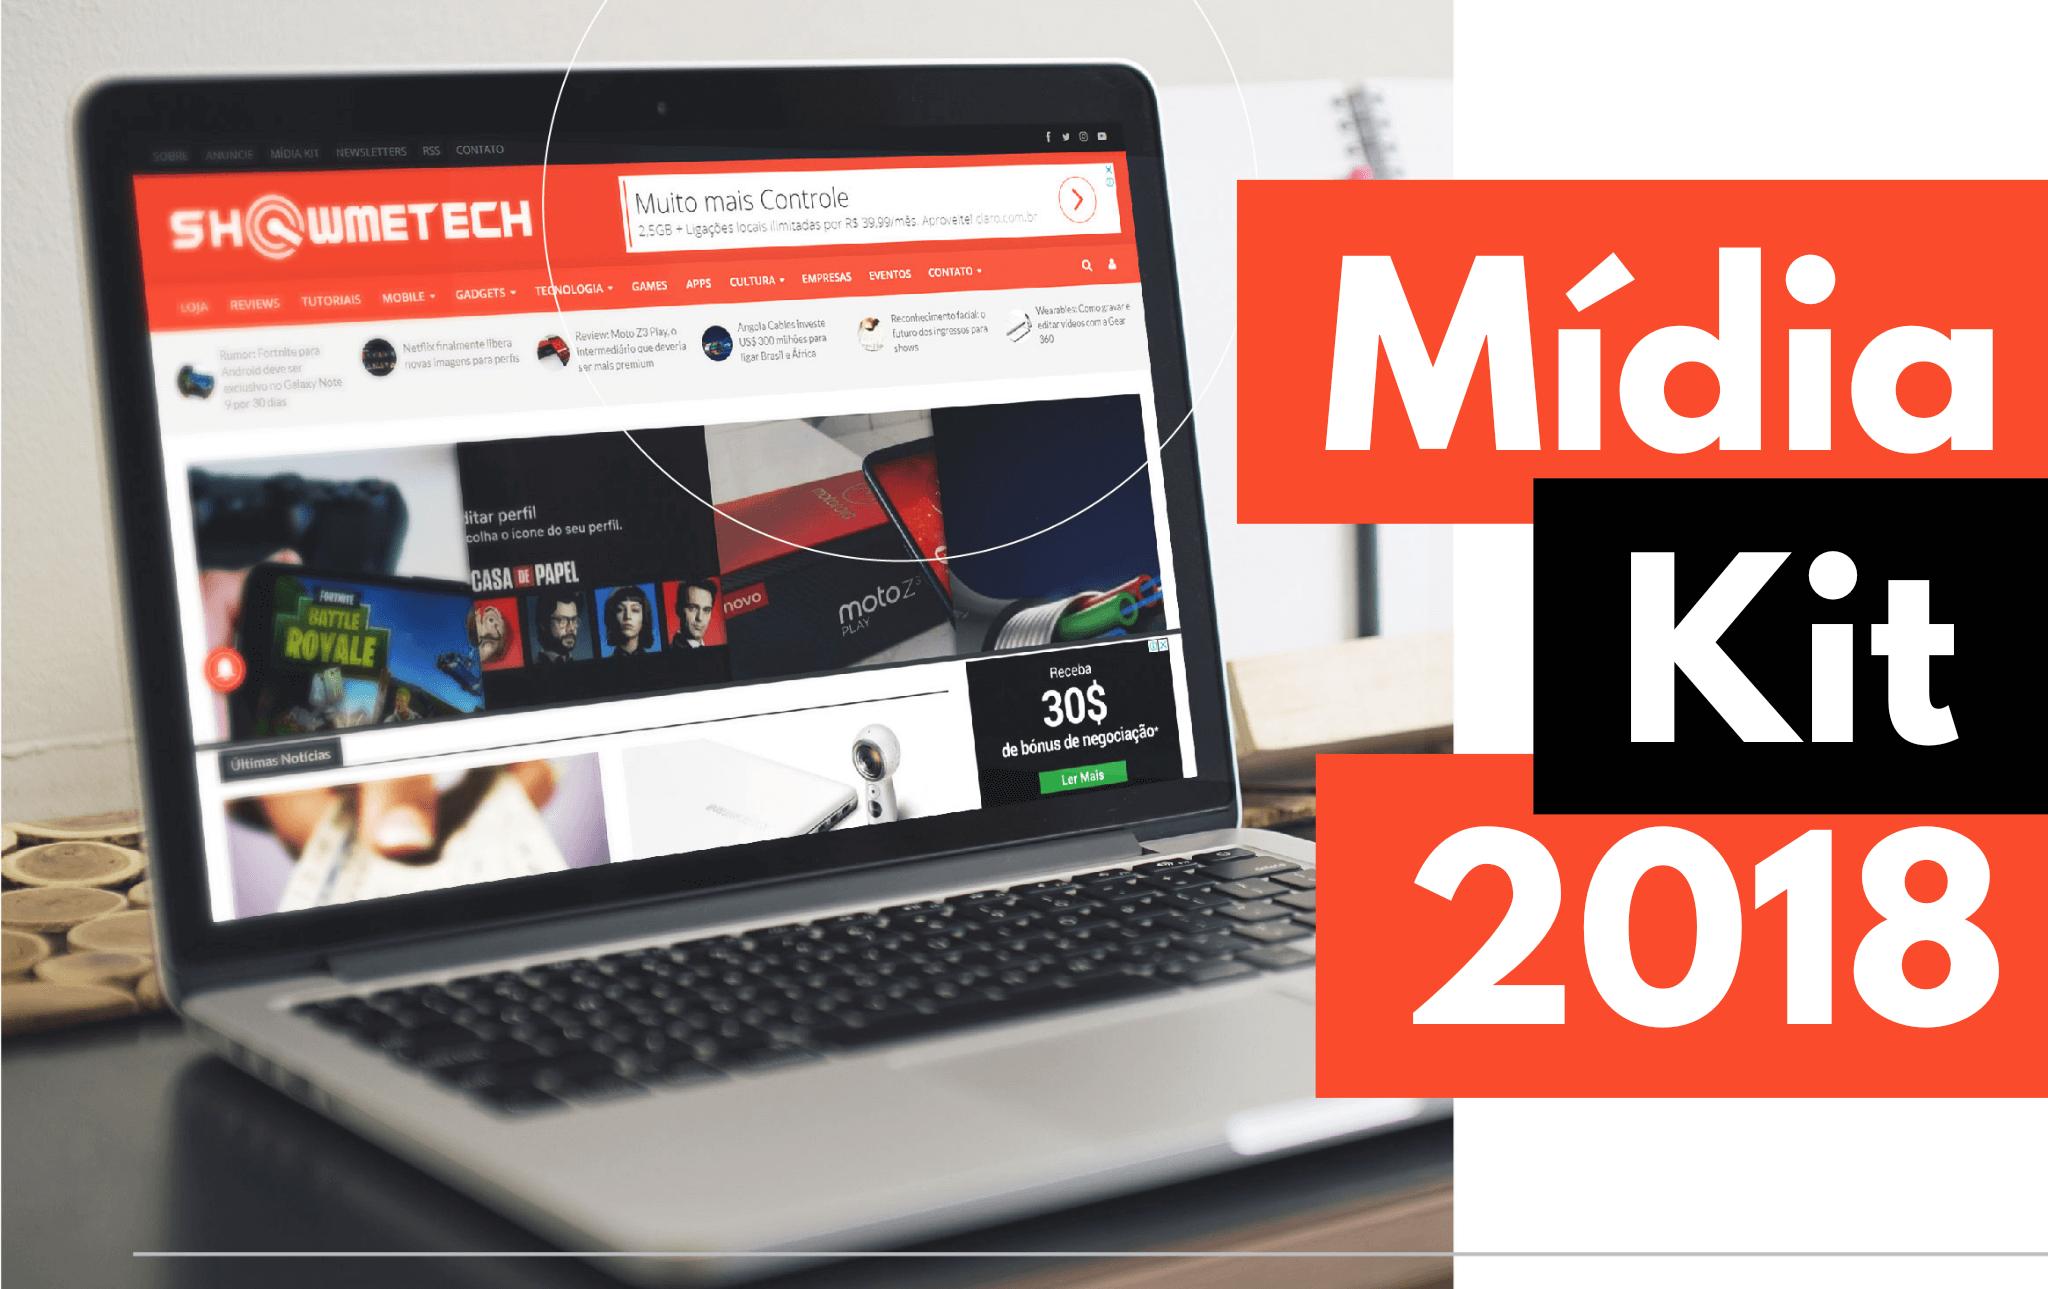 Showmetech Mídia Kit 2018 - Mídia Kit